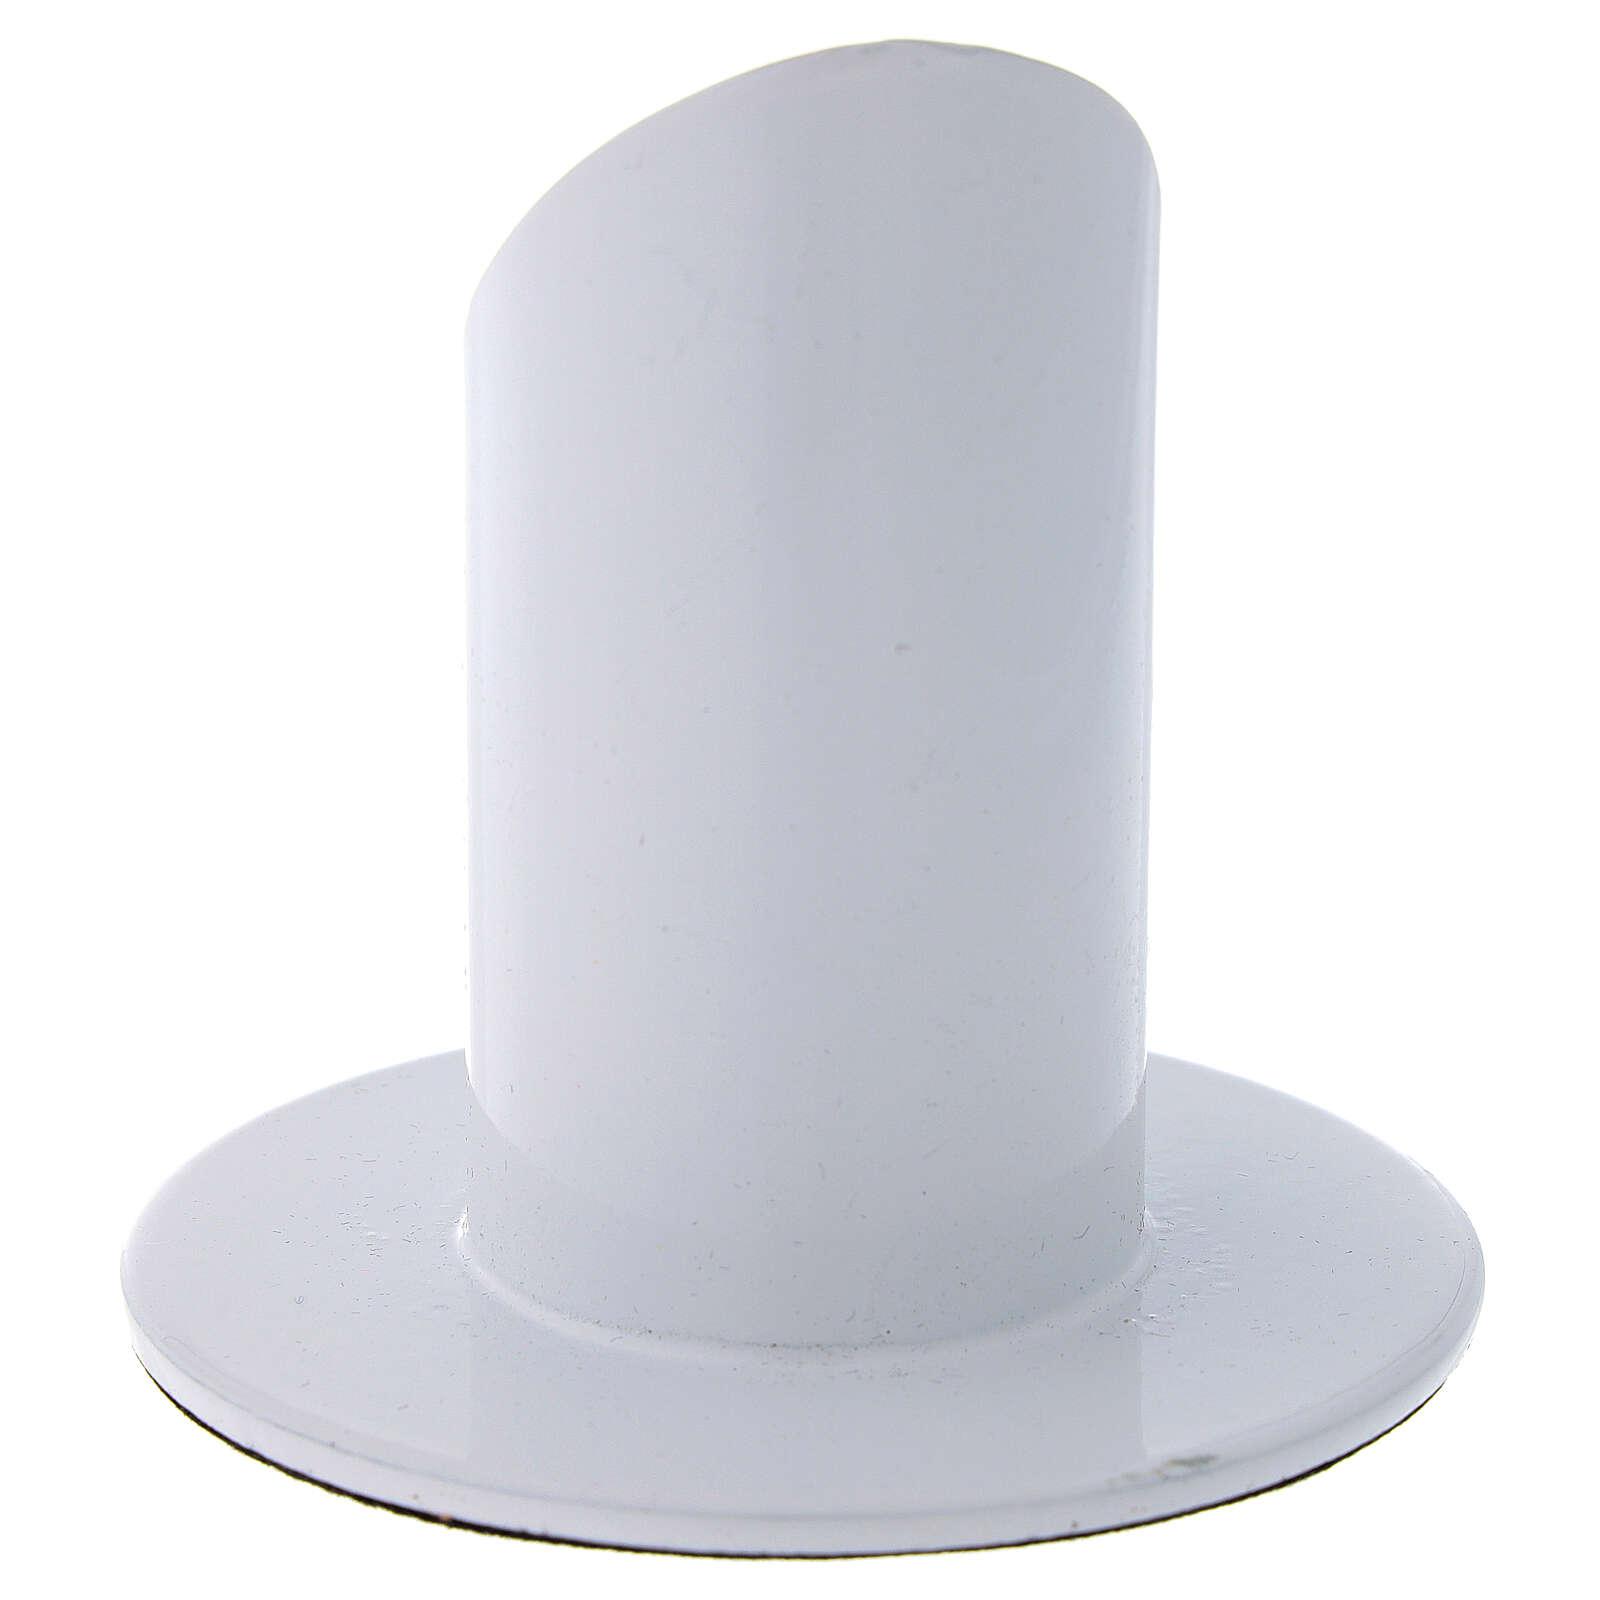 Portacandela in ottone bianco 3 cm 3